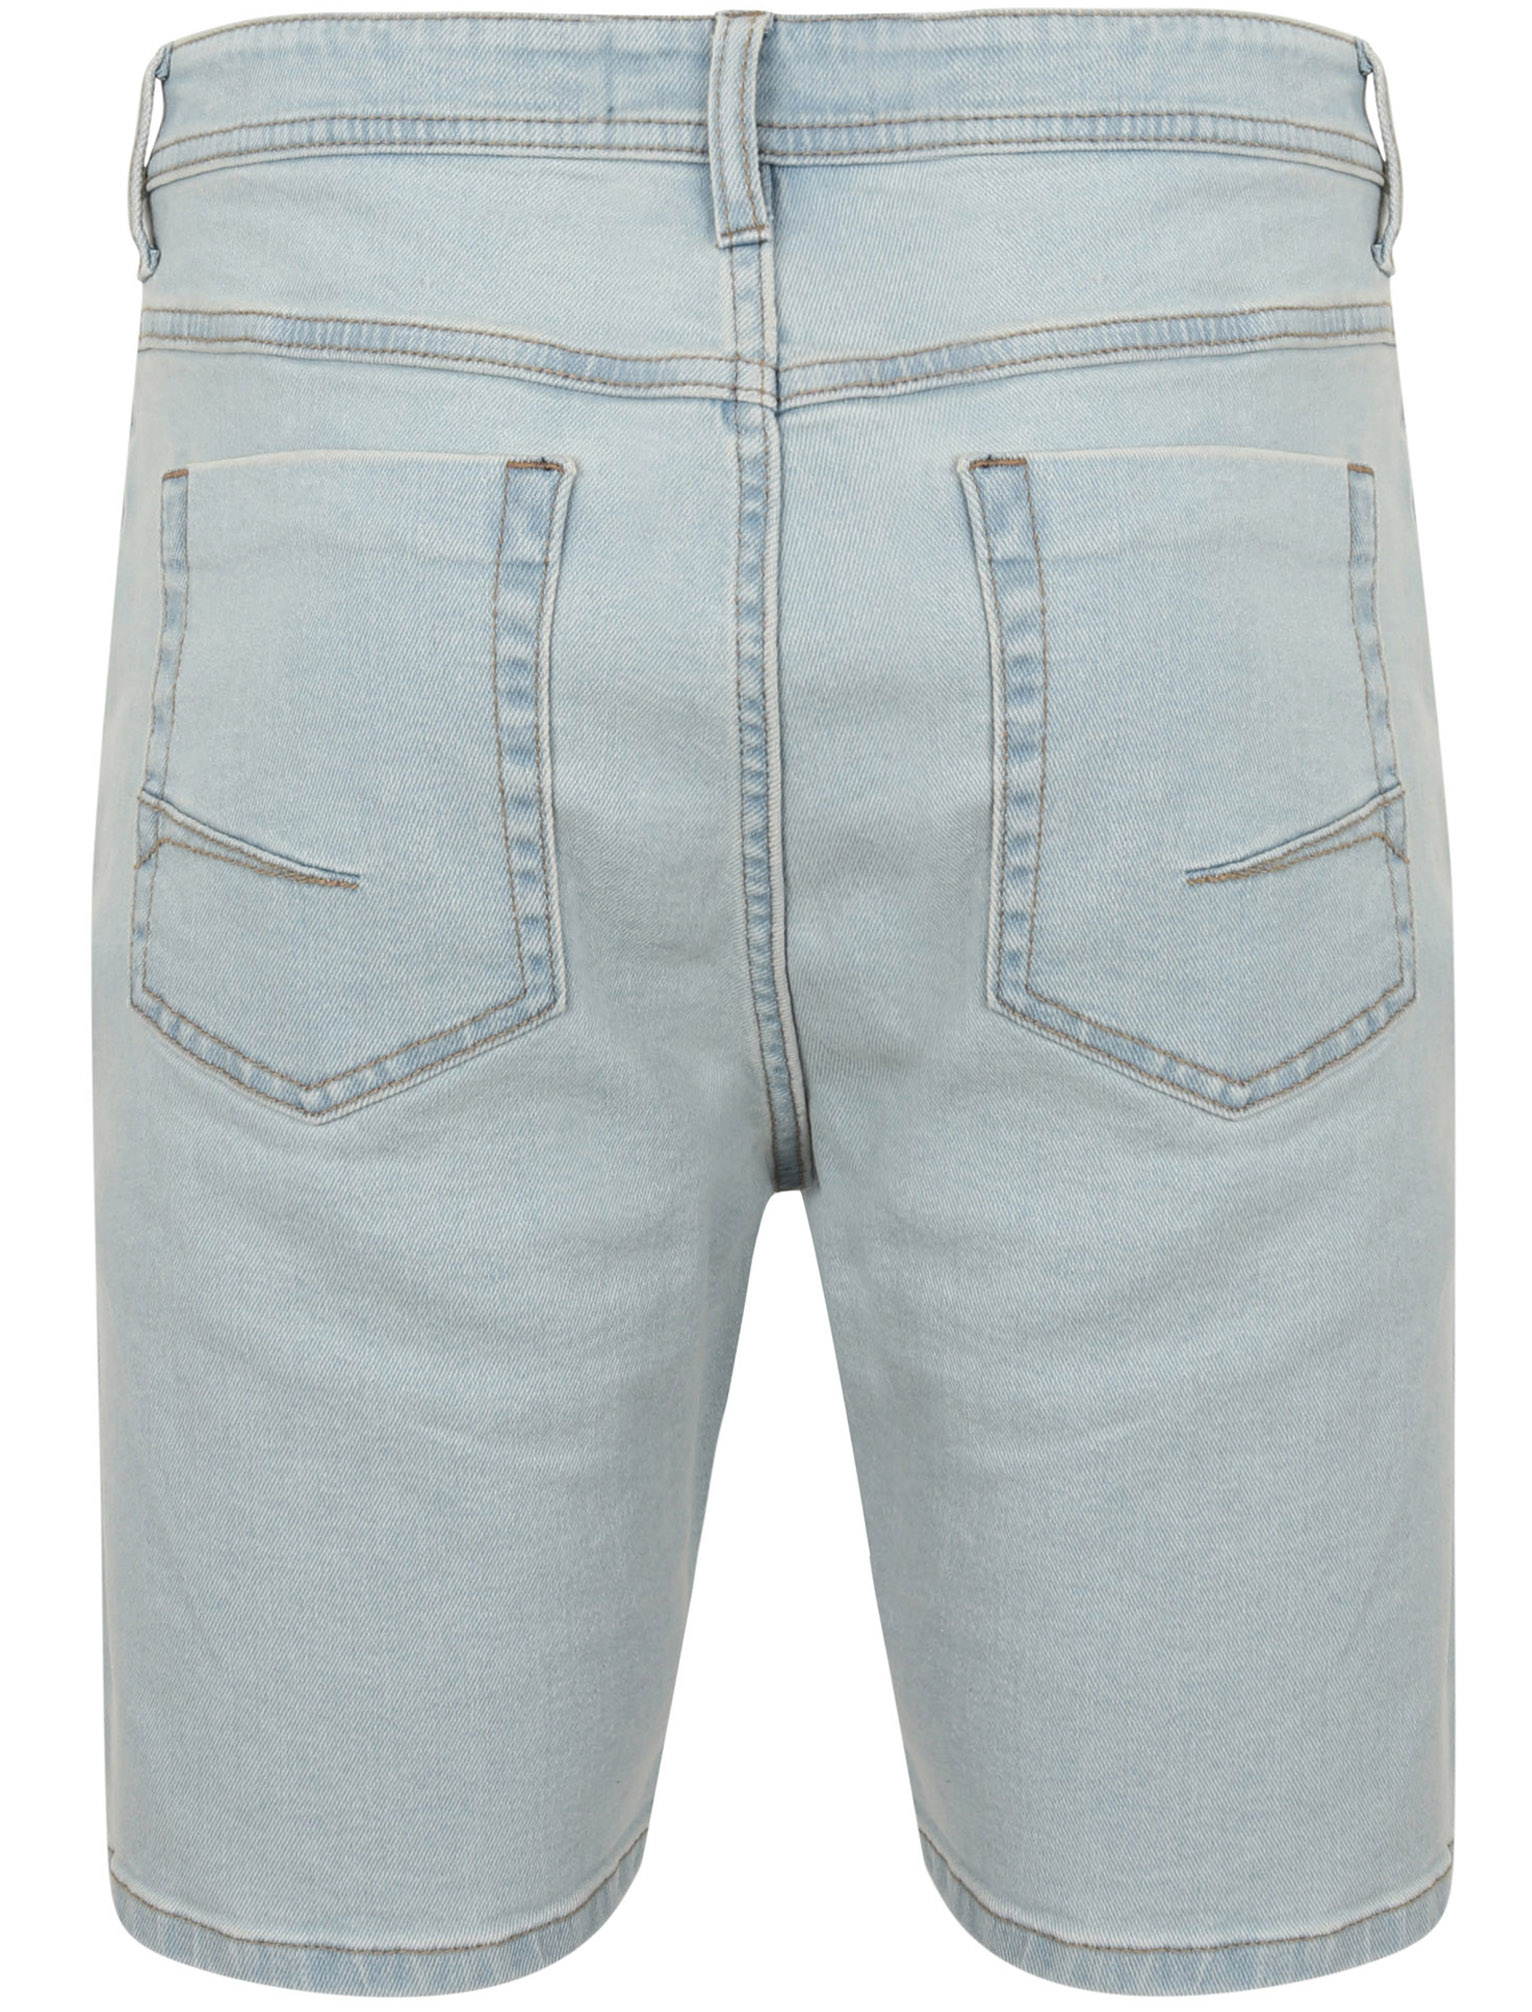 Tokyo-Laundry-Mens-Stretch-Denim-Shorts-Chino-Jean-Vintage-Dark-Light-Wash-Slim thumbnail 3